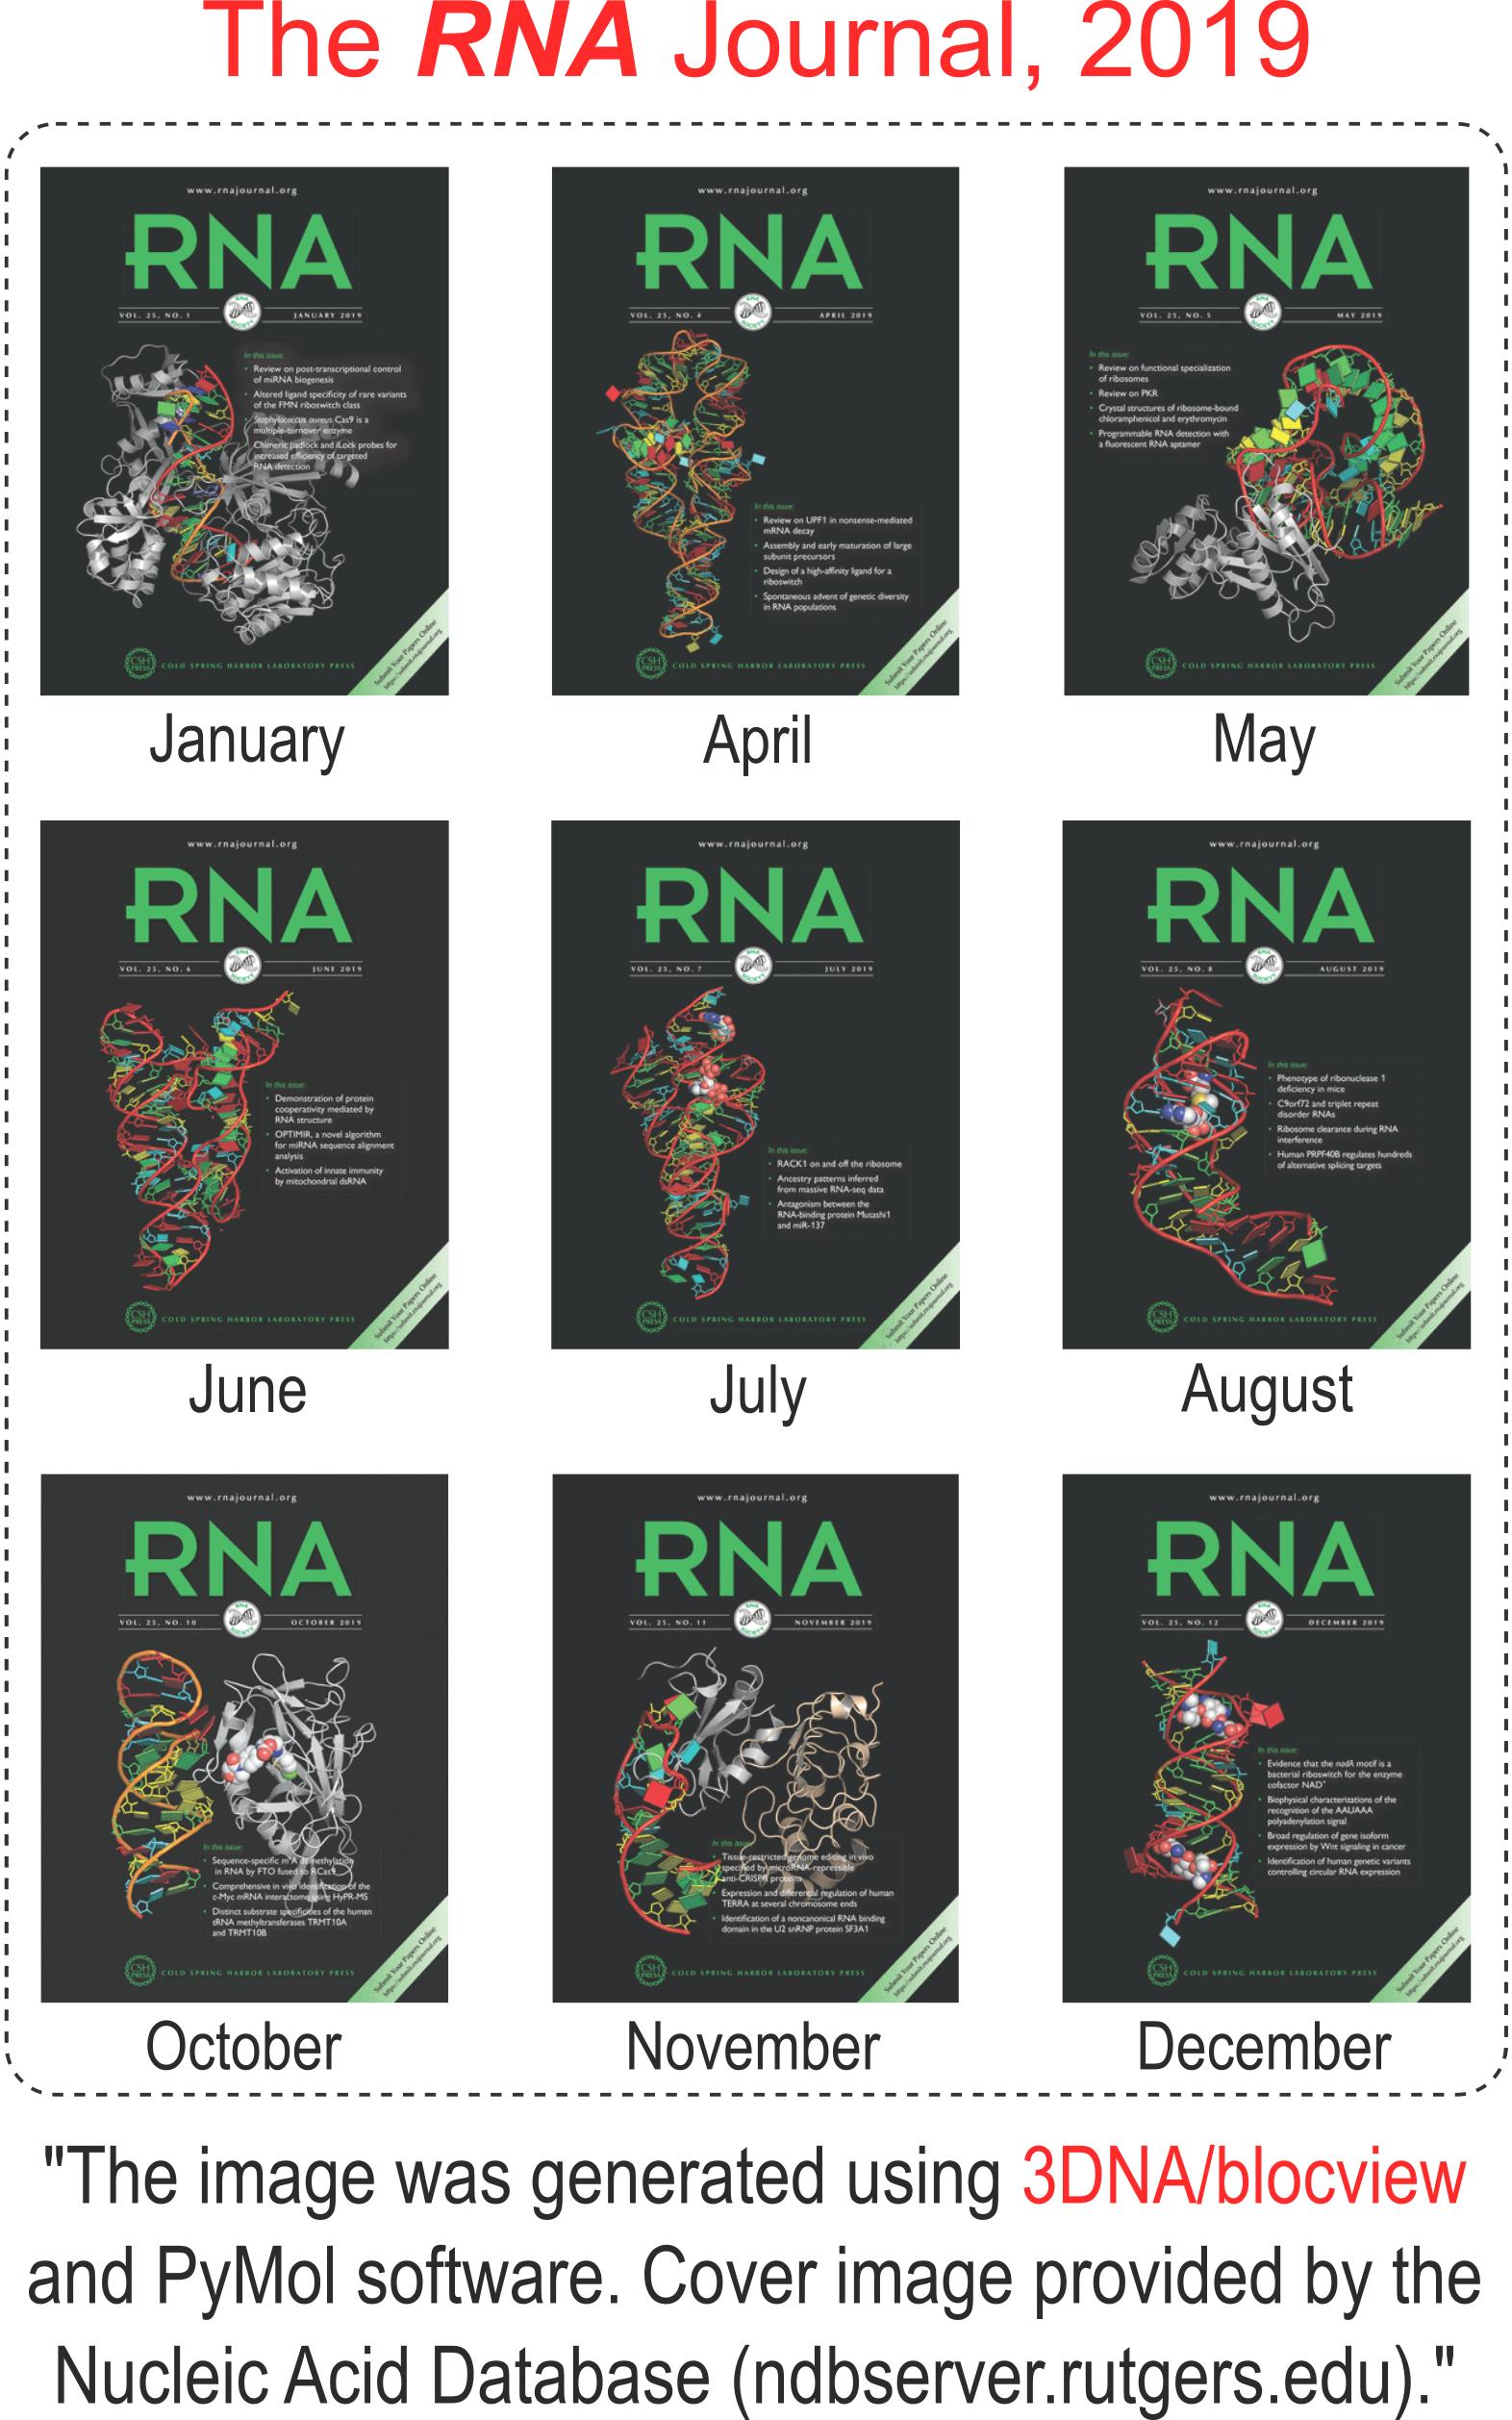 3DNA/blockview-PyMOL cartoon-block schematics in the covers of the RNA journal in 2019